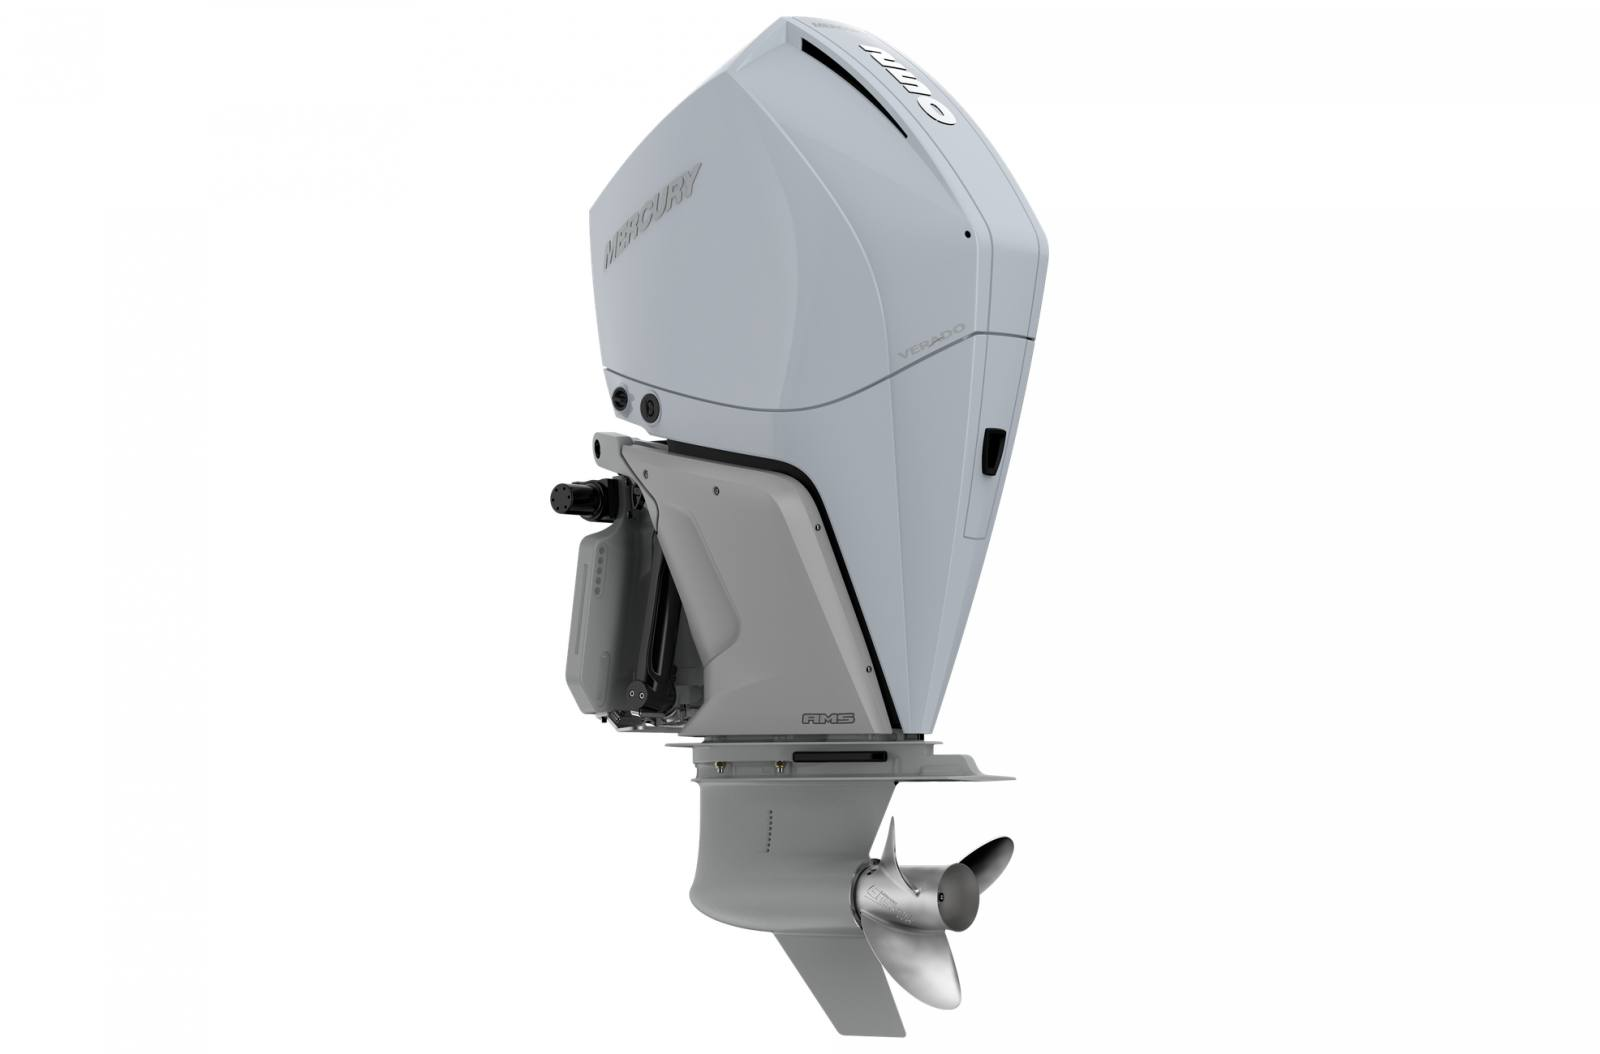 2019 Mercury Marine Verado® V-8 250 HP - 30 in Shaft for sale in